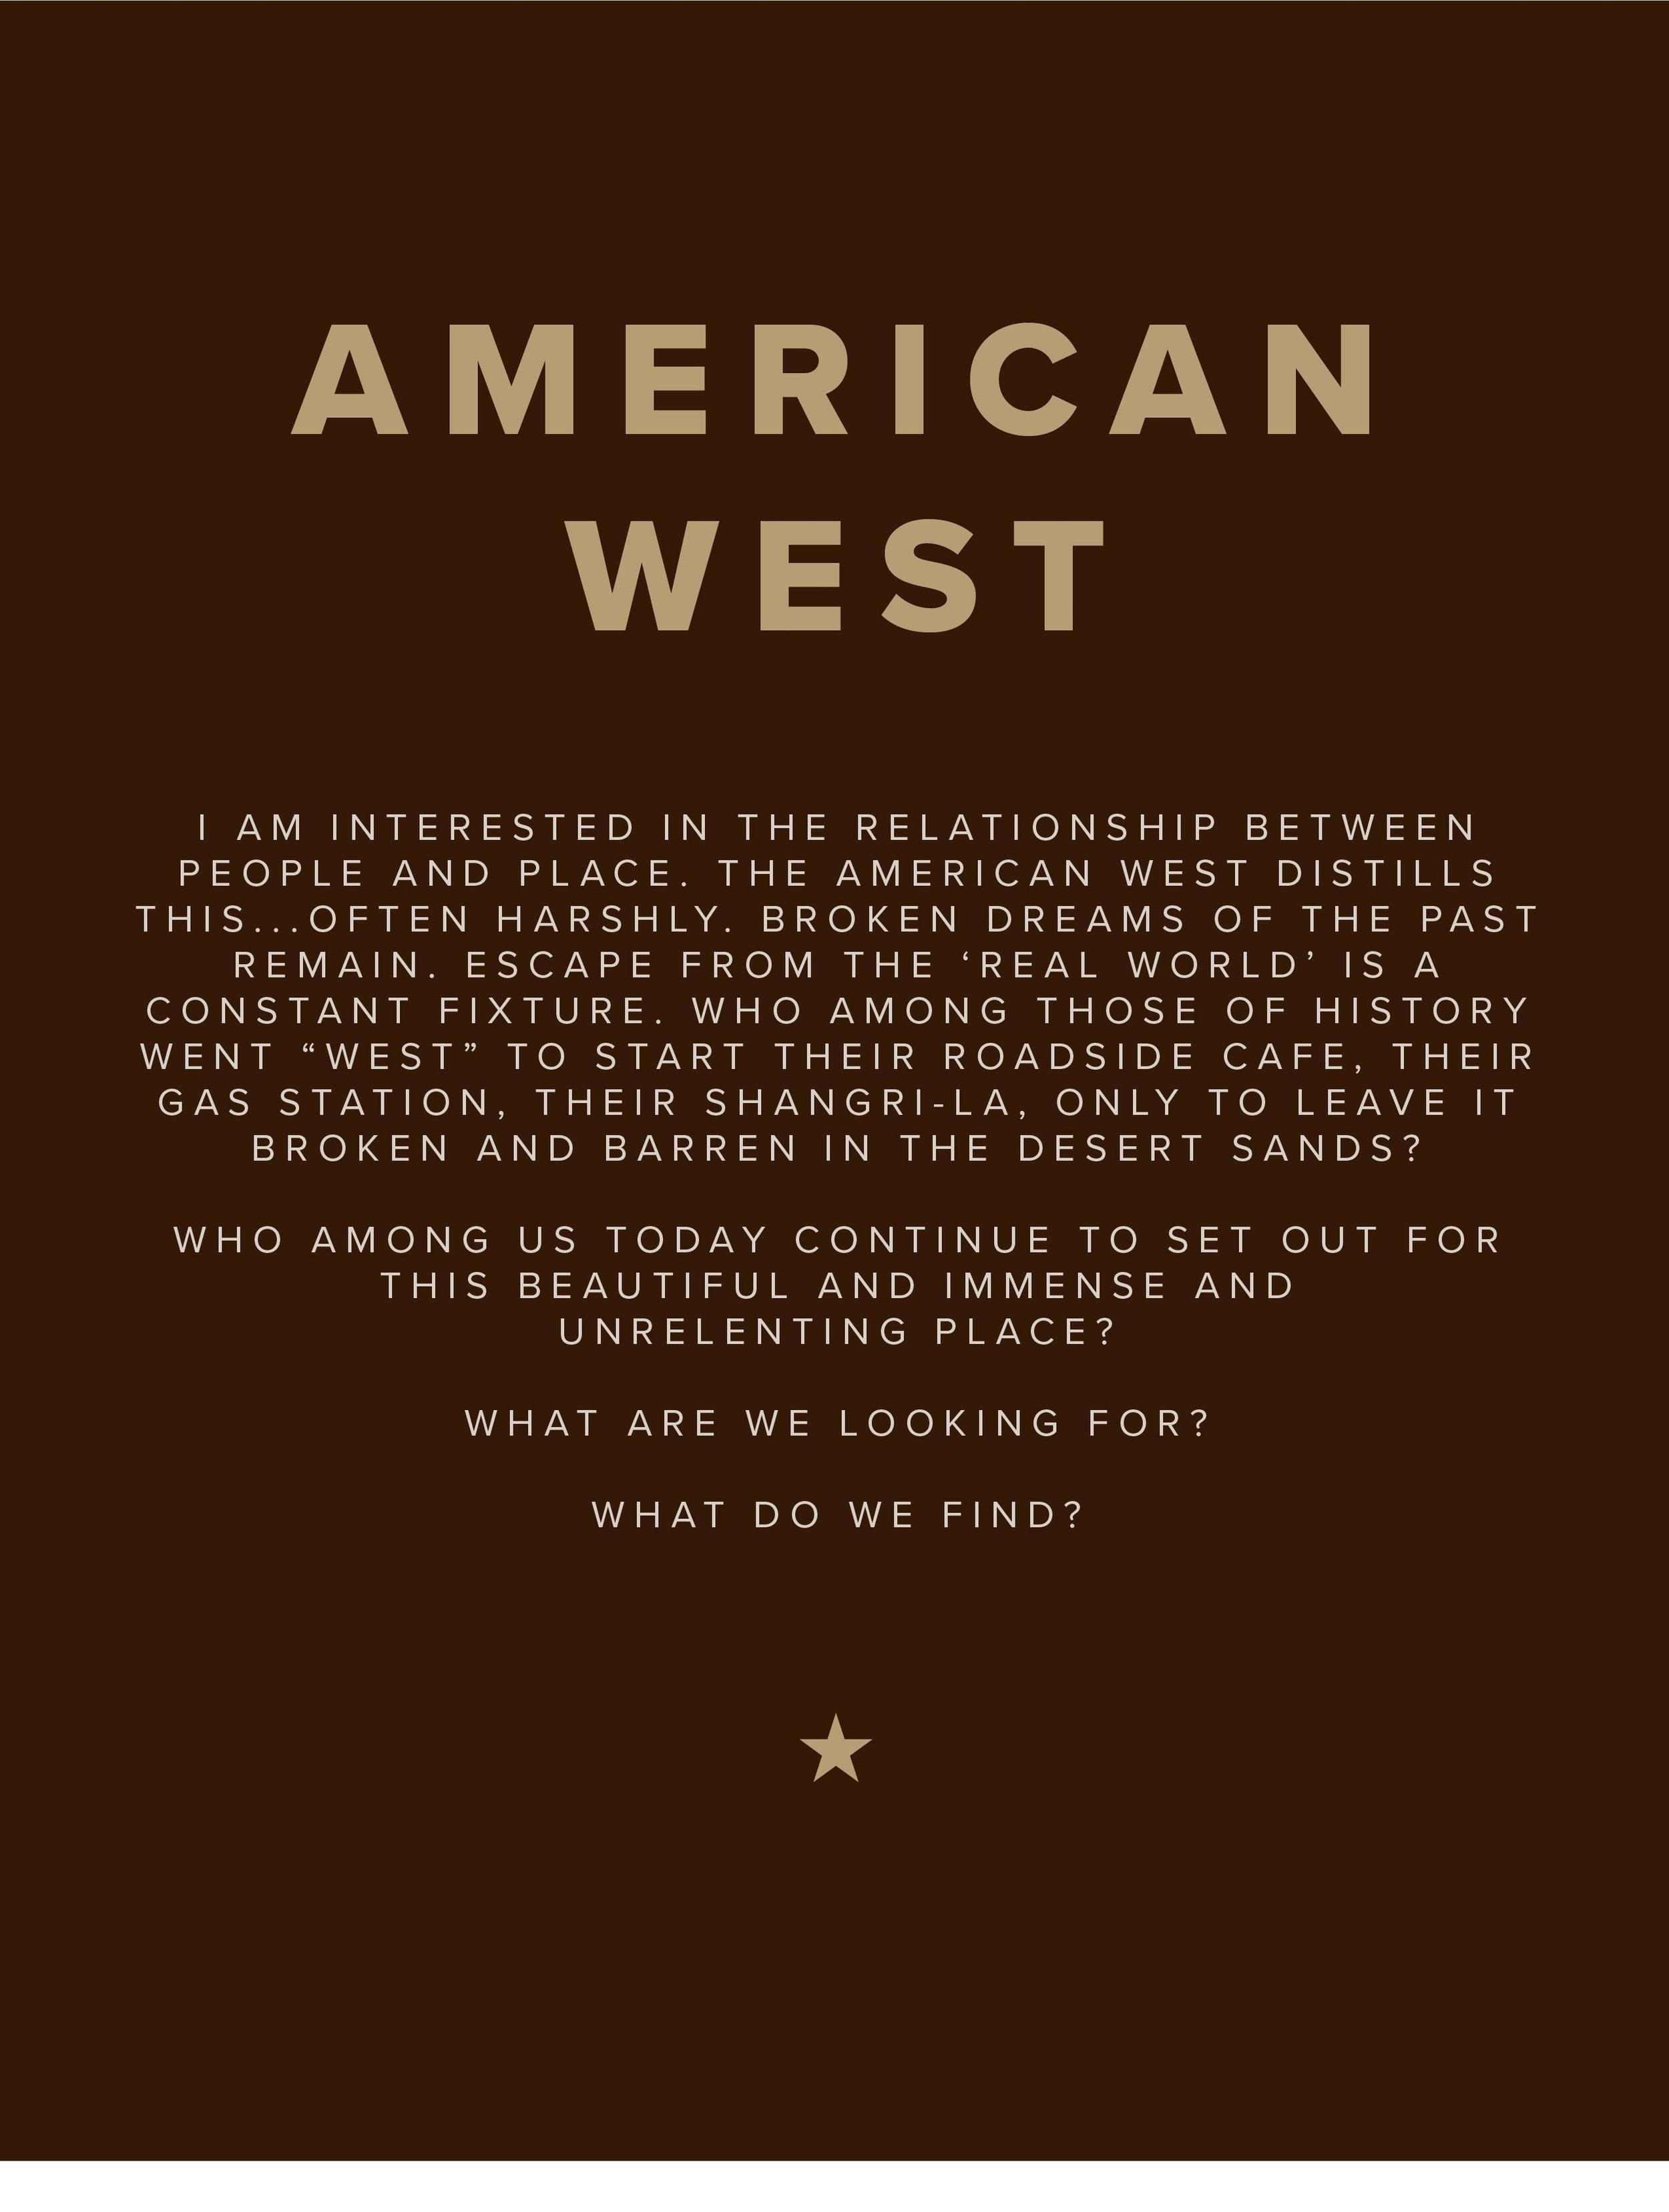 American-West-Why.JPG